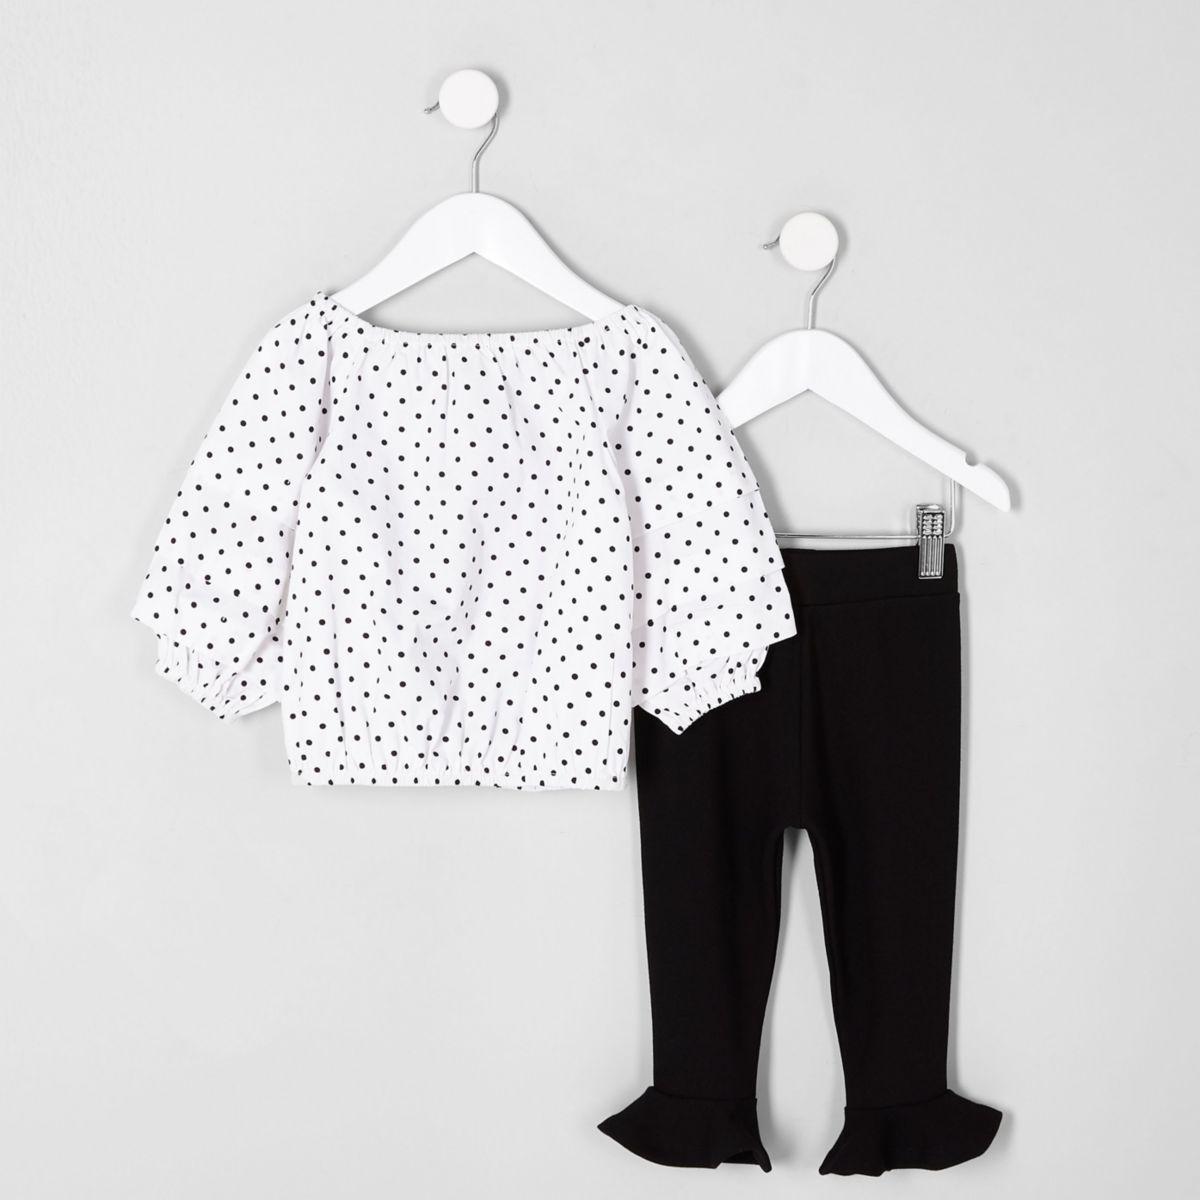 Mini girls white polka dot top outfit